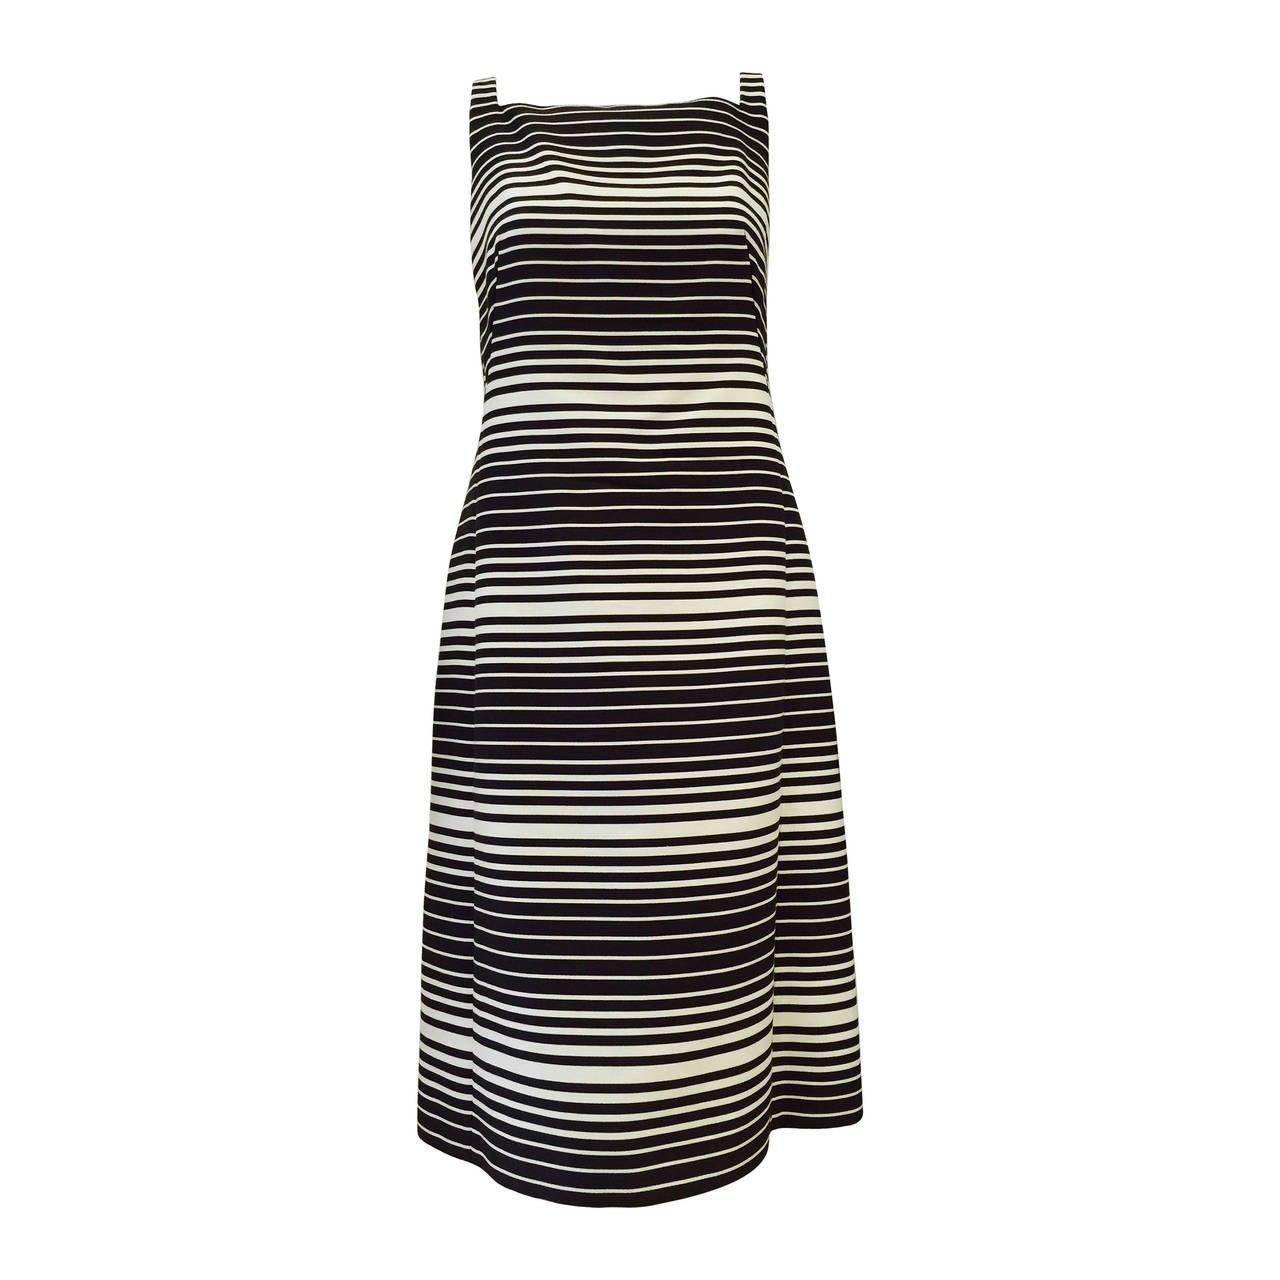 Akris Punto for Bergdorf Goodman Striped Sleeveless Shift